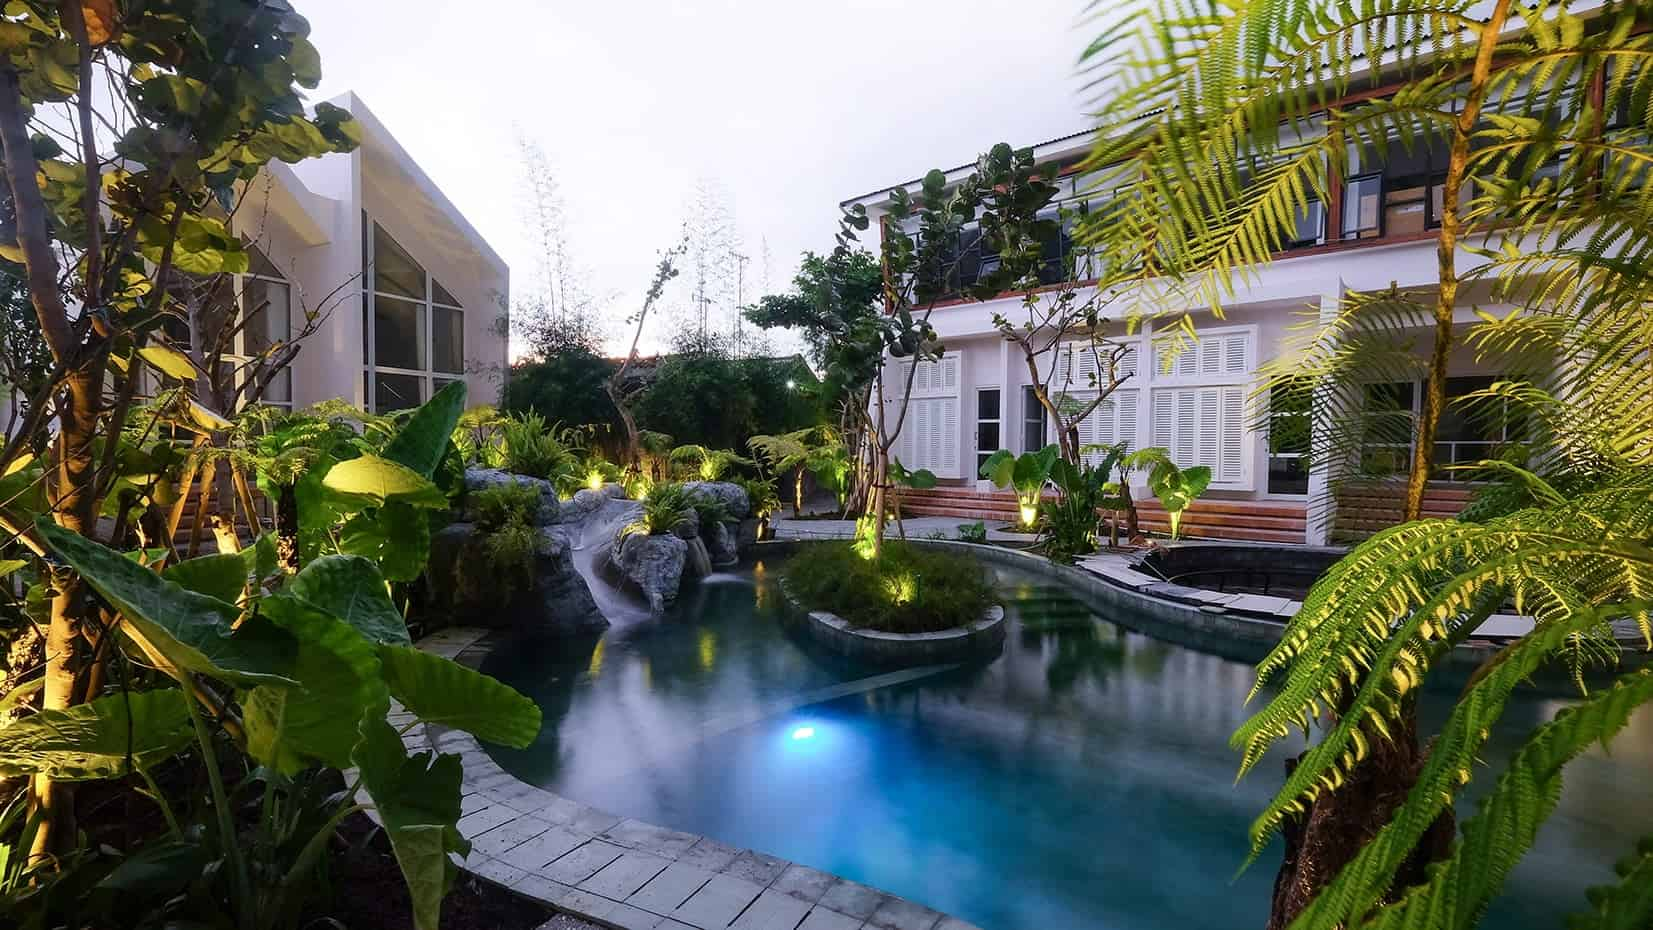 8 Rekomendasi Hotel Instagramable di Jogja Yang Bakal Bikin Feed Ig Kamu Makin Keren